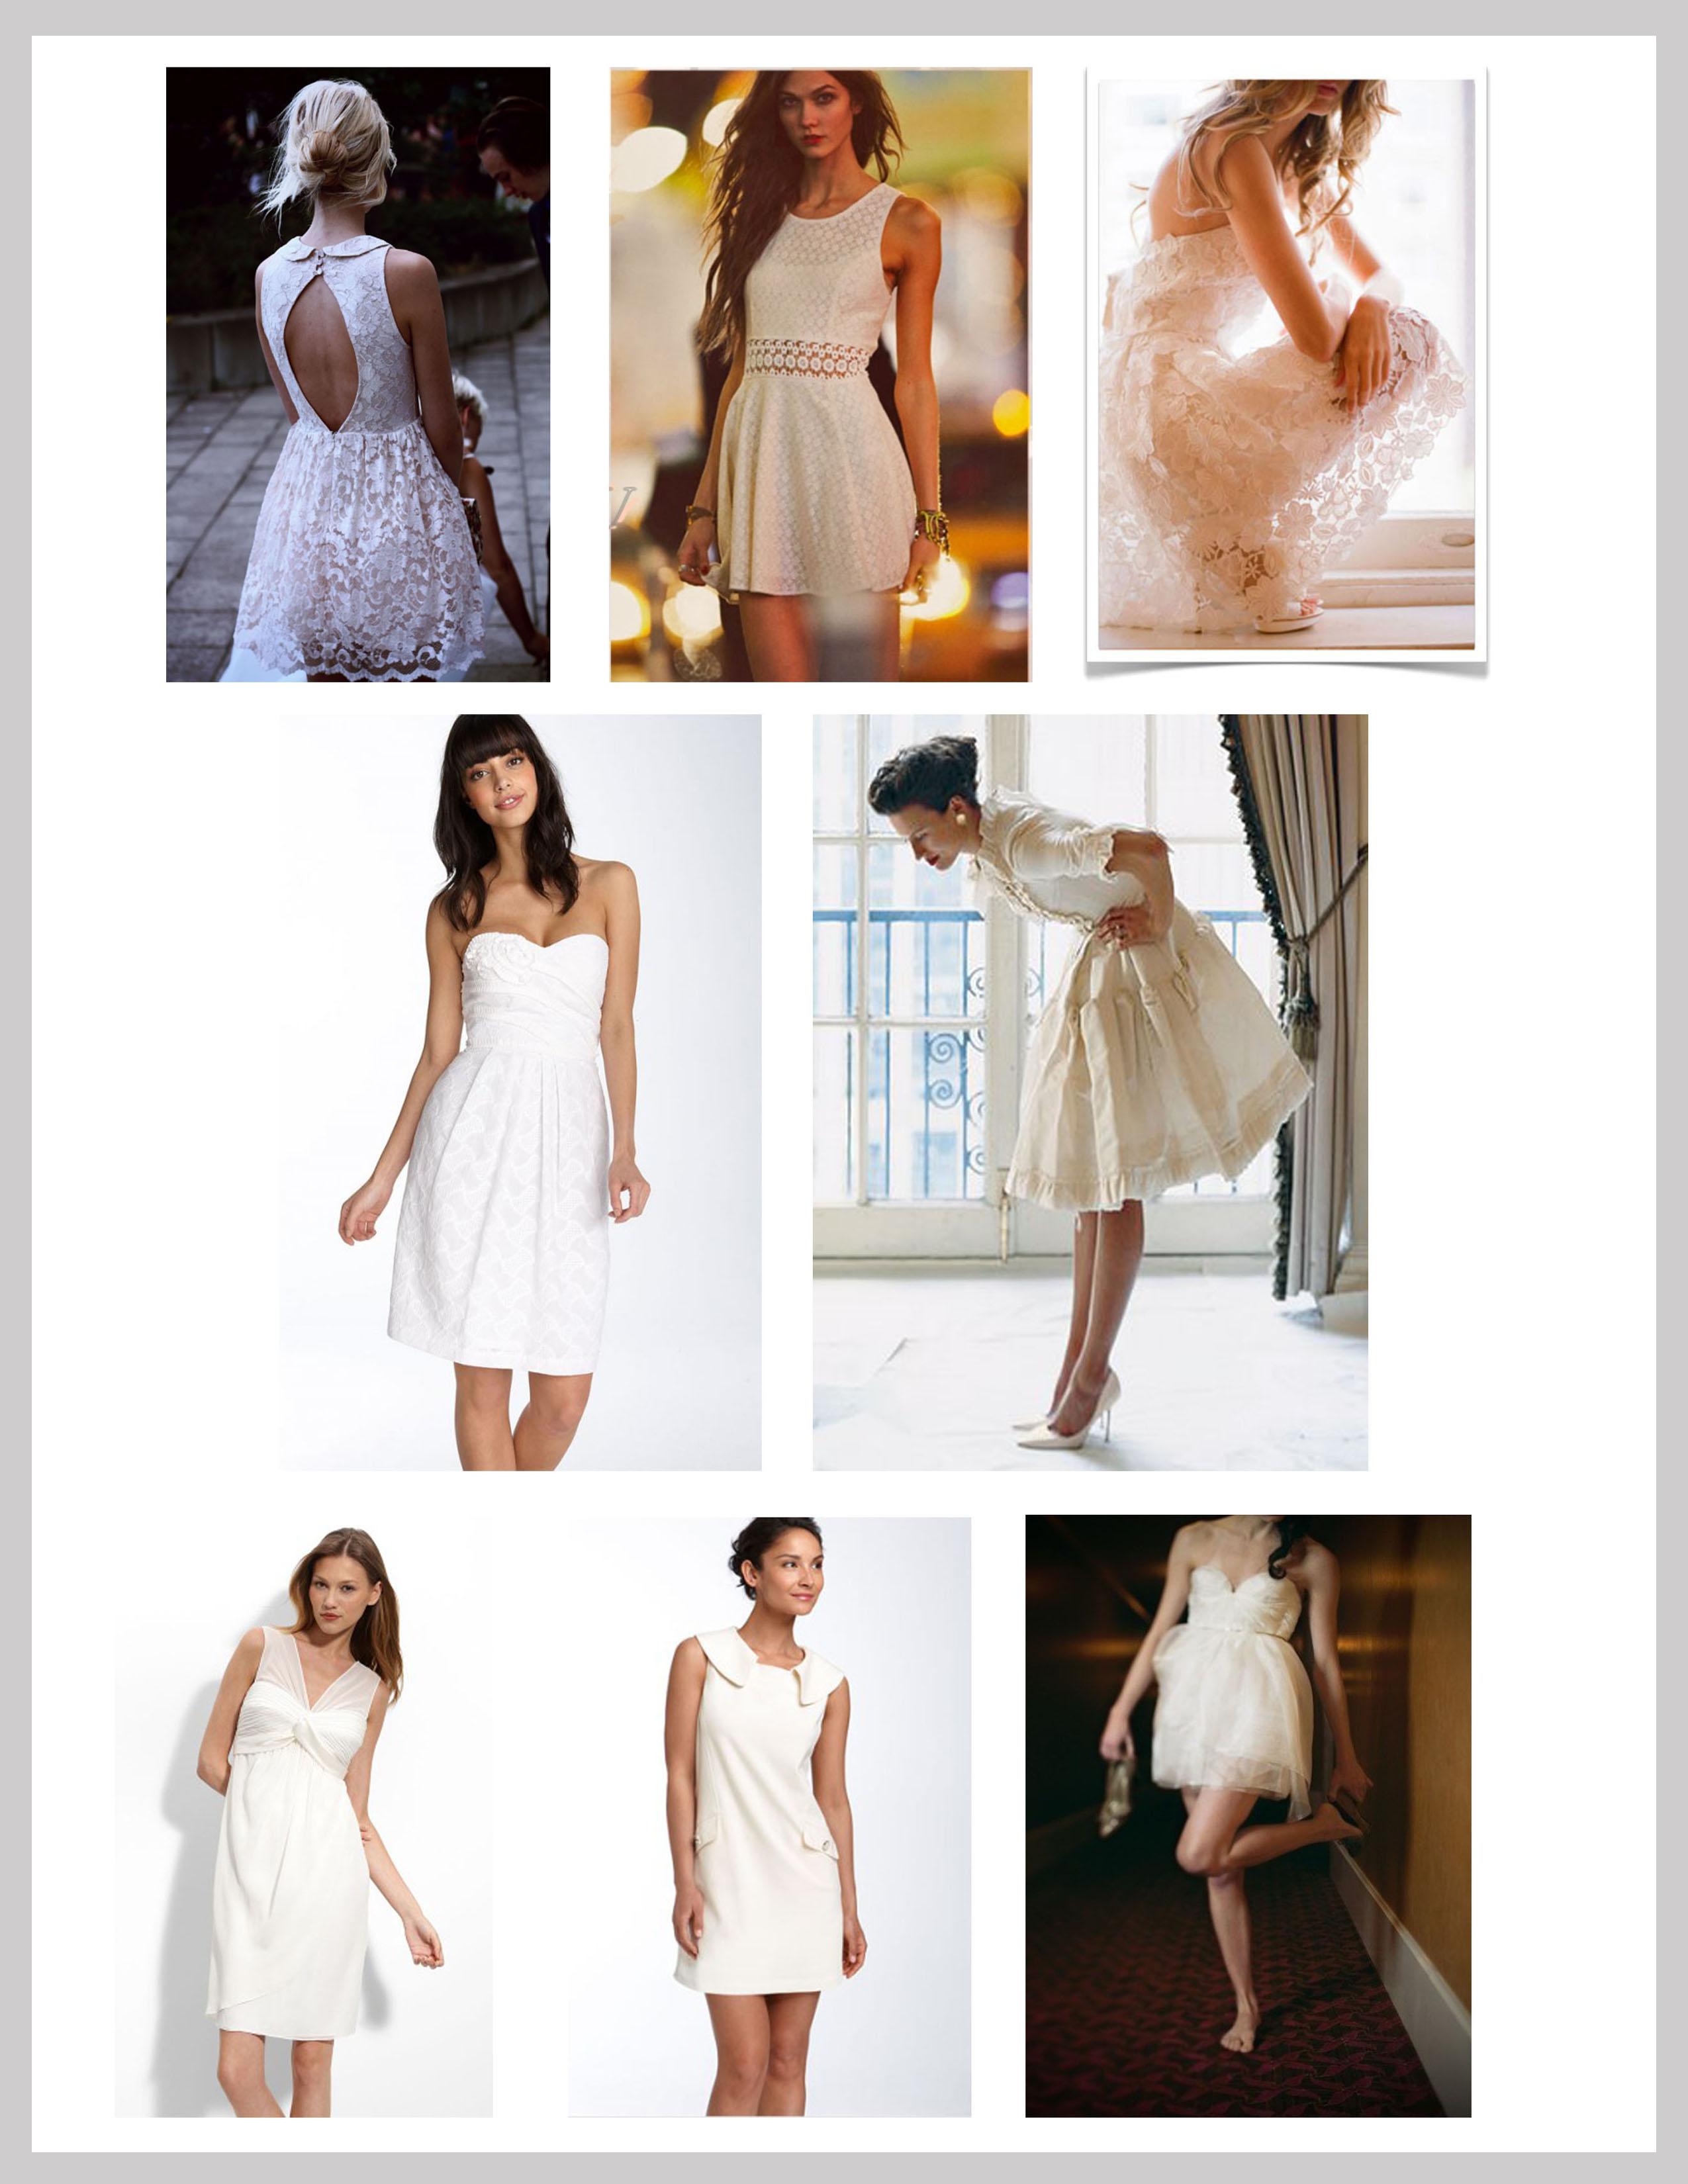 Rehearsal Dinner Dresses | My Wedding Bag